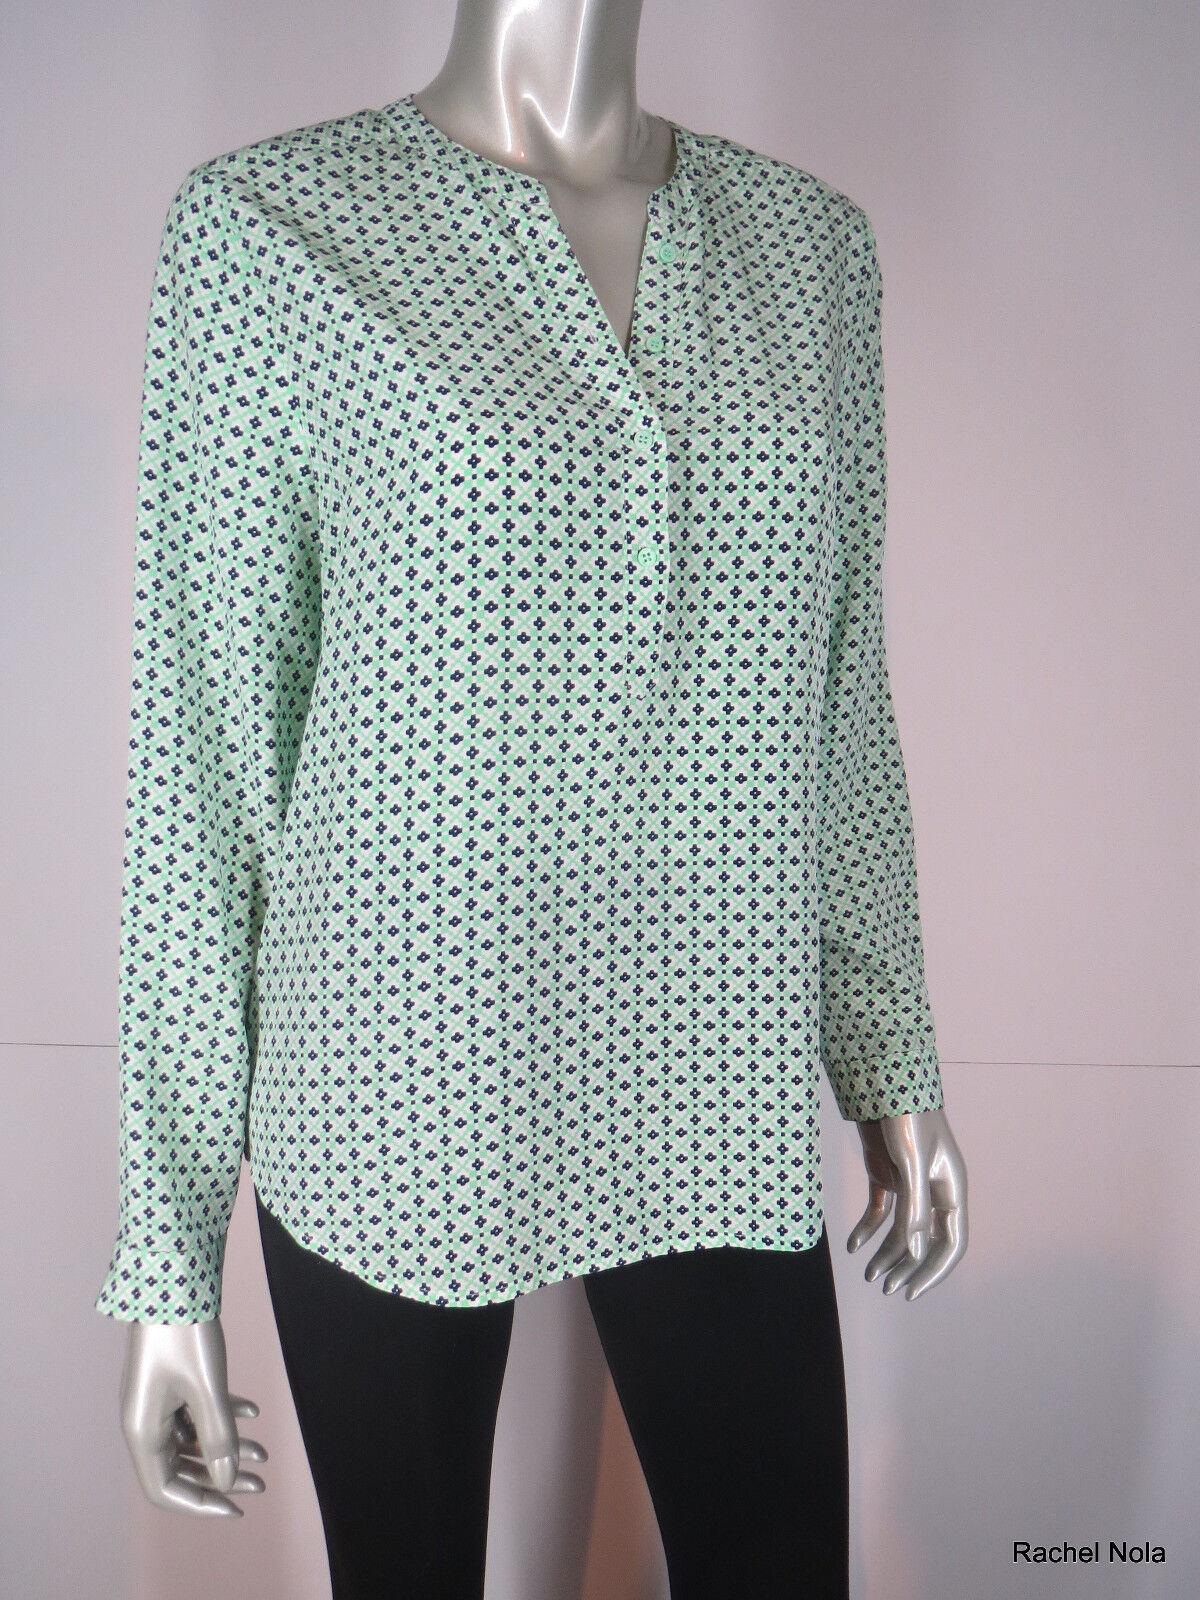 Joie Blouse Tunic Silk Größe L M Grün Blau Ivory Mod Geometric Print Long Sleeve